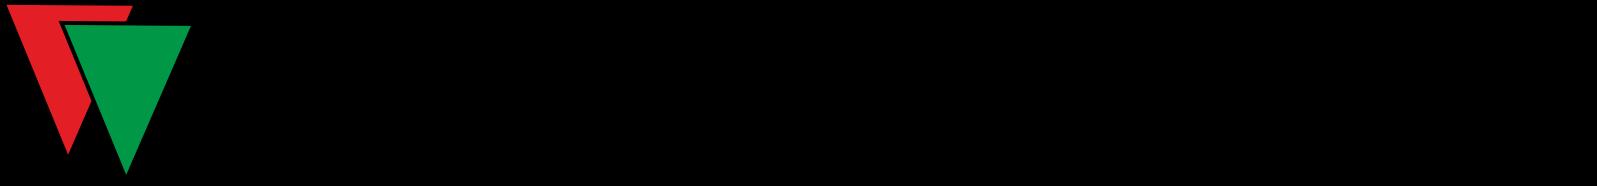 Rifan Financindo Berjangka Semarang Logo